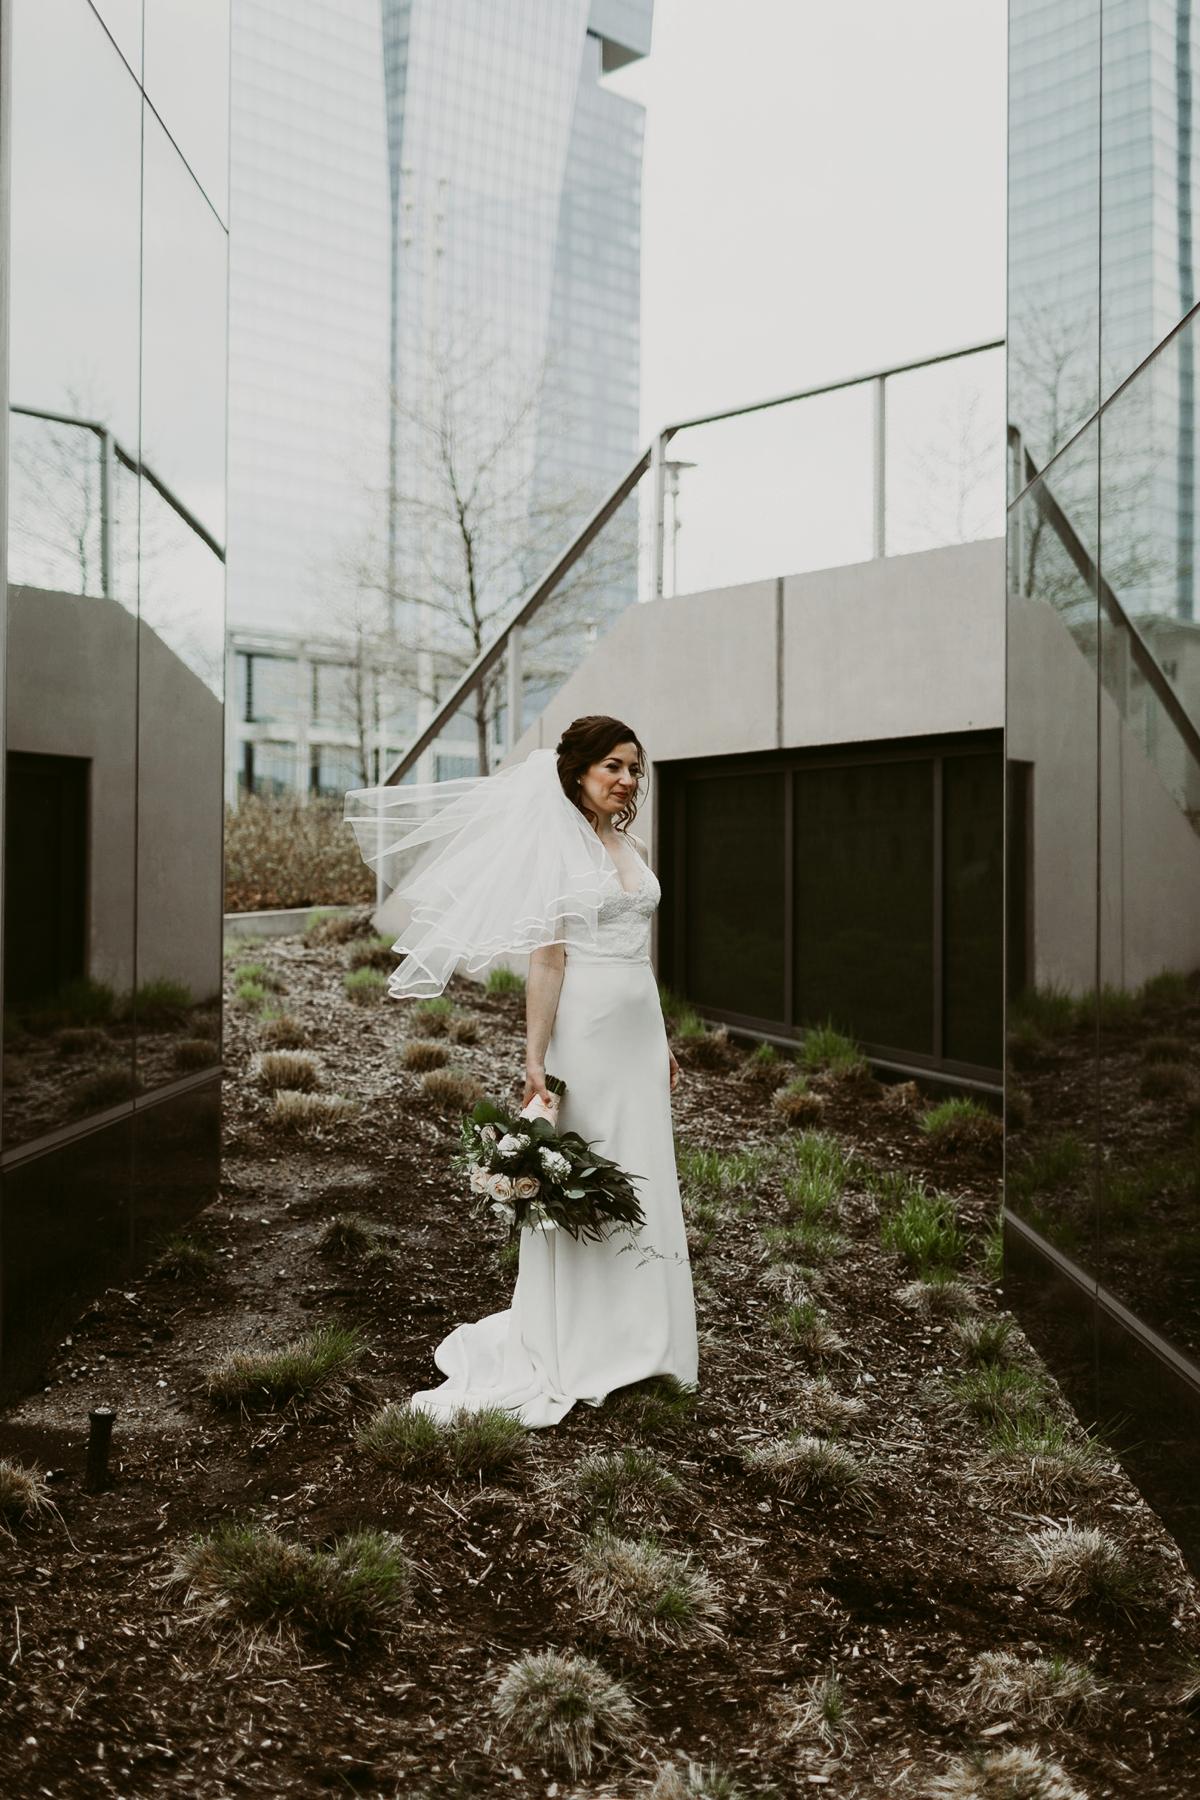 Rachel+Michael_Lake-Erie-Building-Cleveland-Wedding_M+J-Photographers-138.jpg